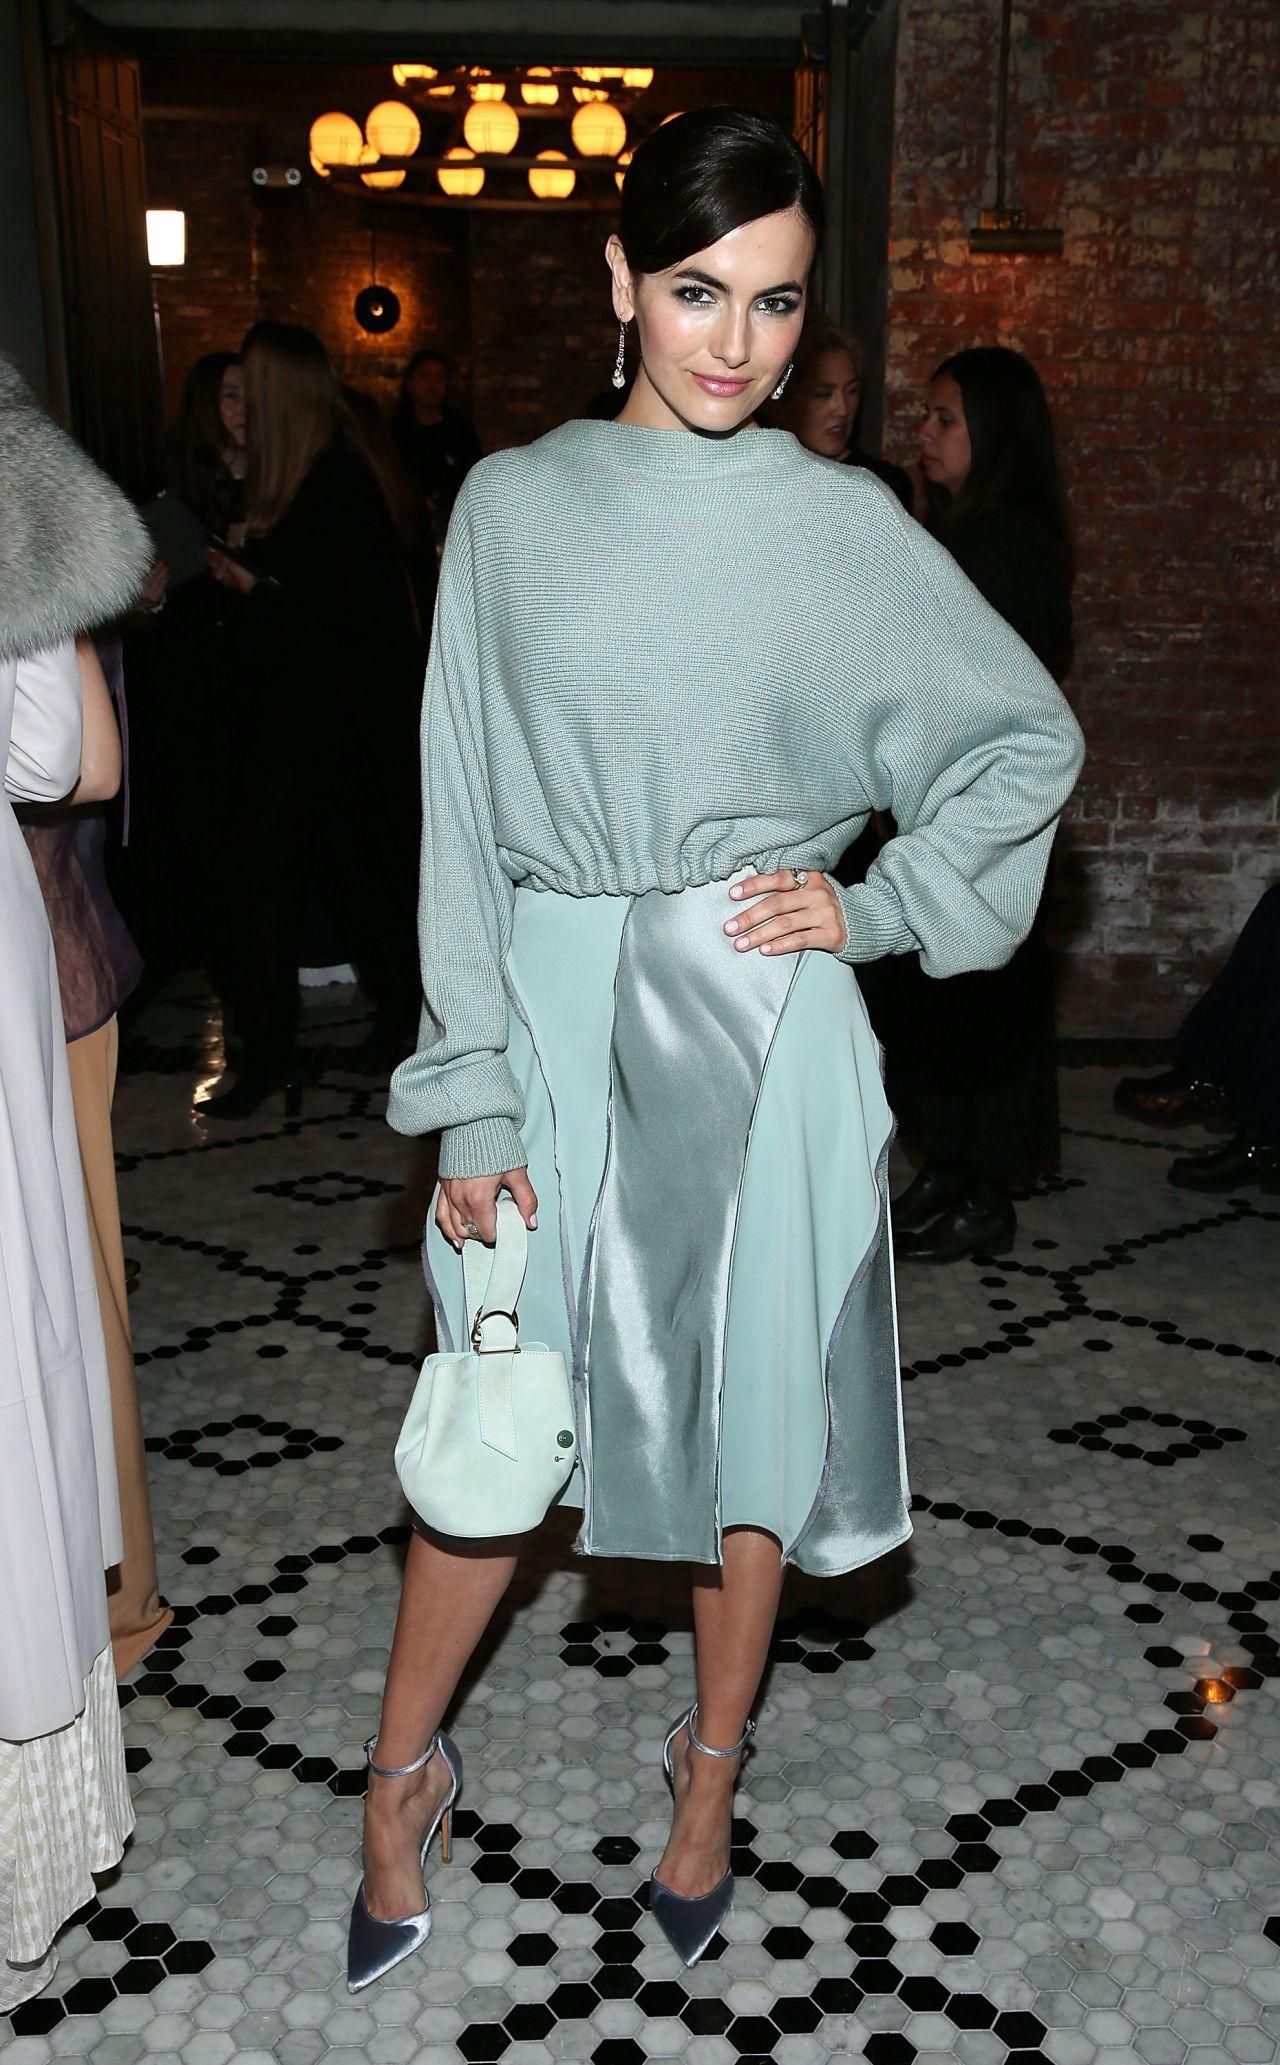 http://celebmafia.com/wp-content/uploads/2018/02/camilla-belle-adeam-fashion-show-at-new-york-fashion-week-02-08-2018-5.jpg